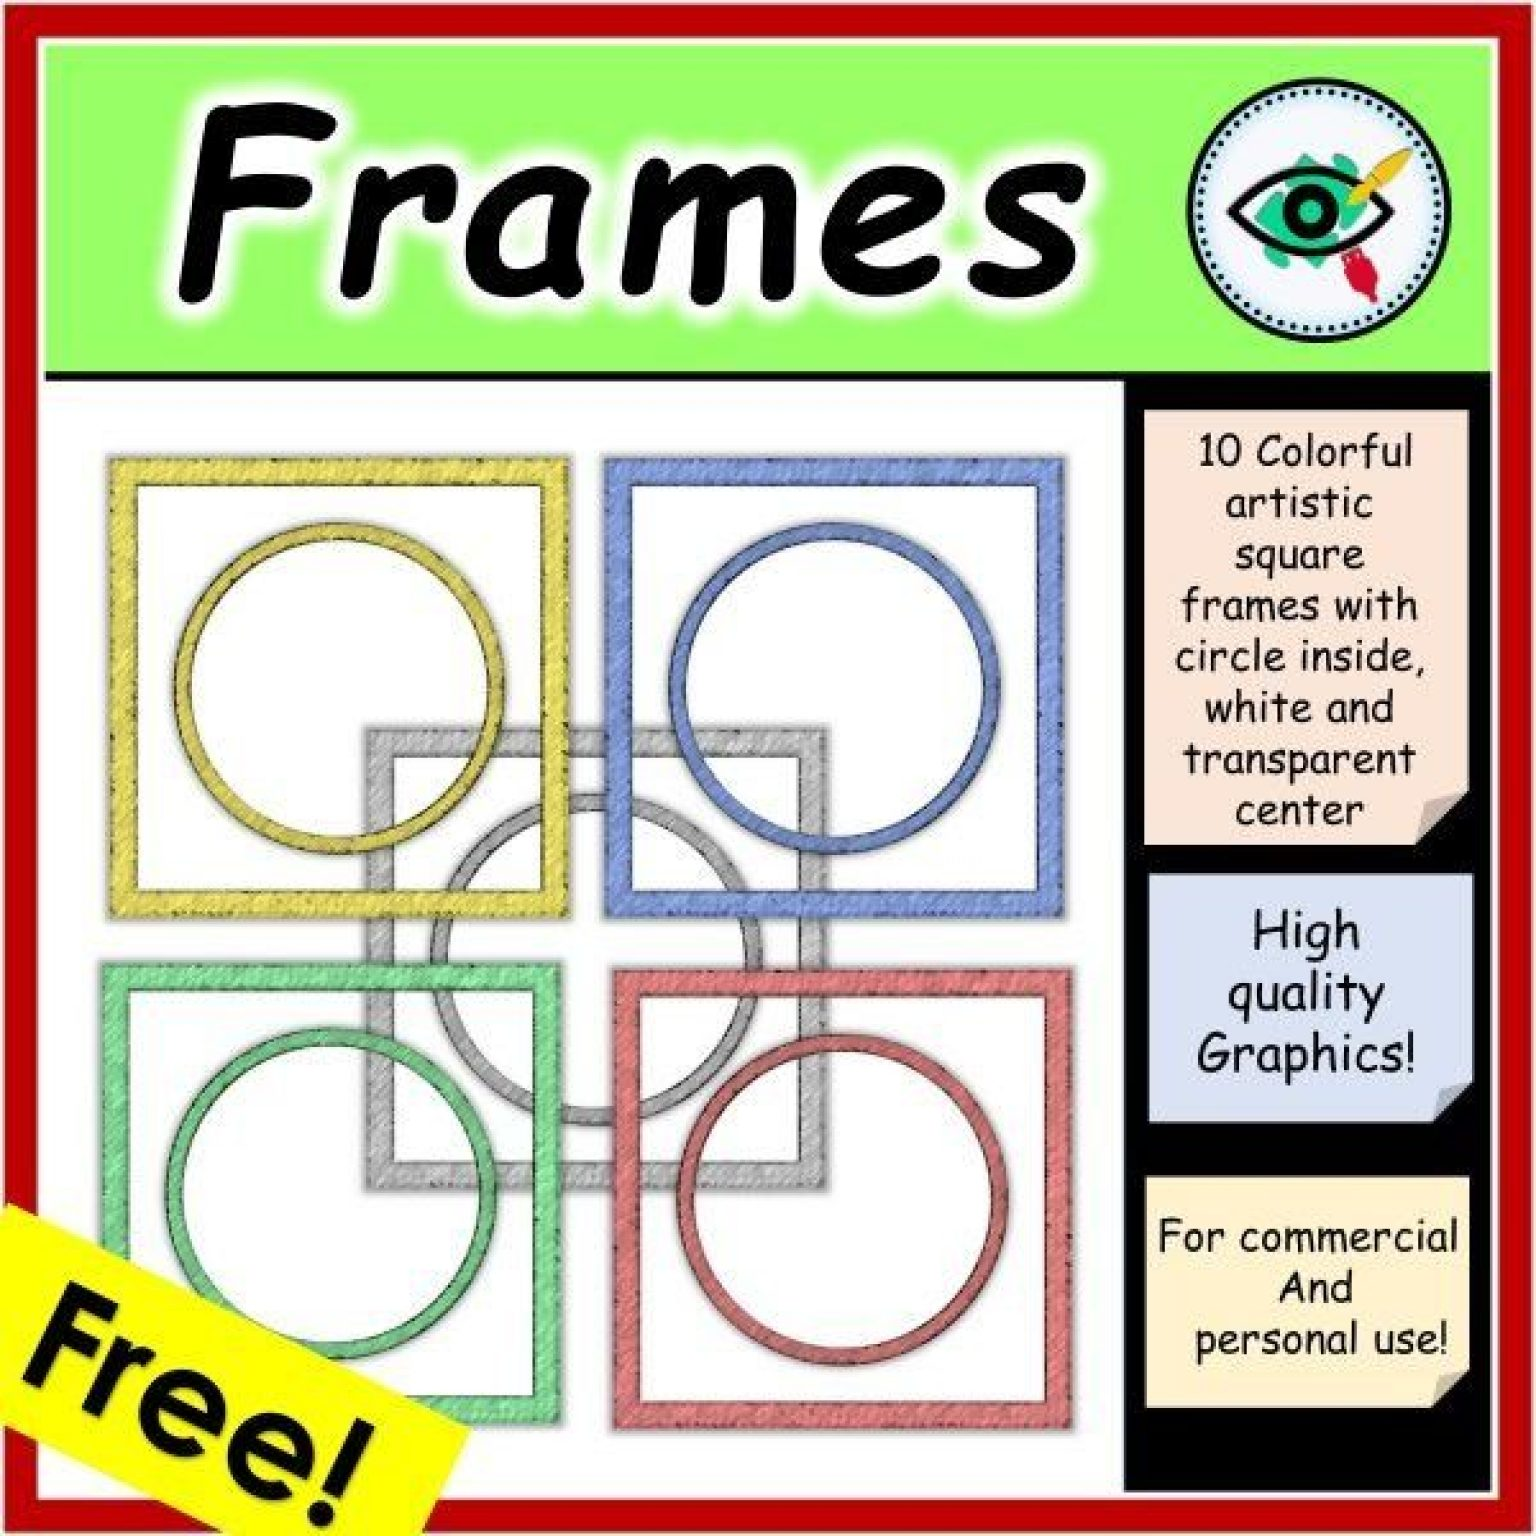 frames-free-title2